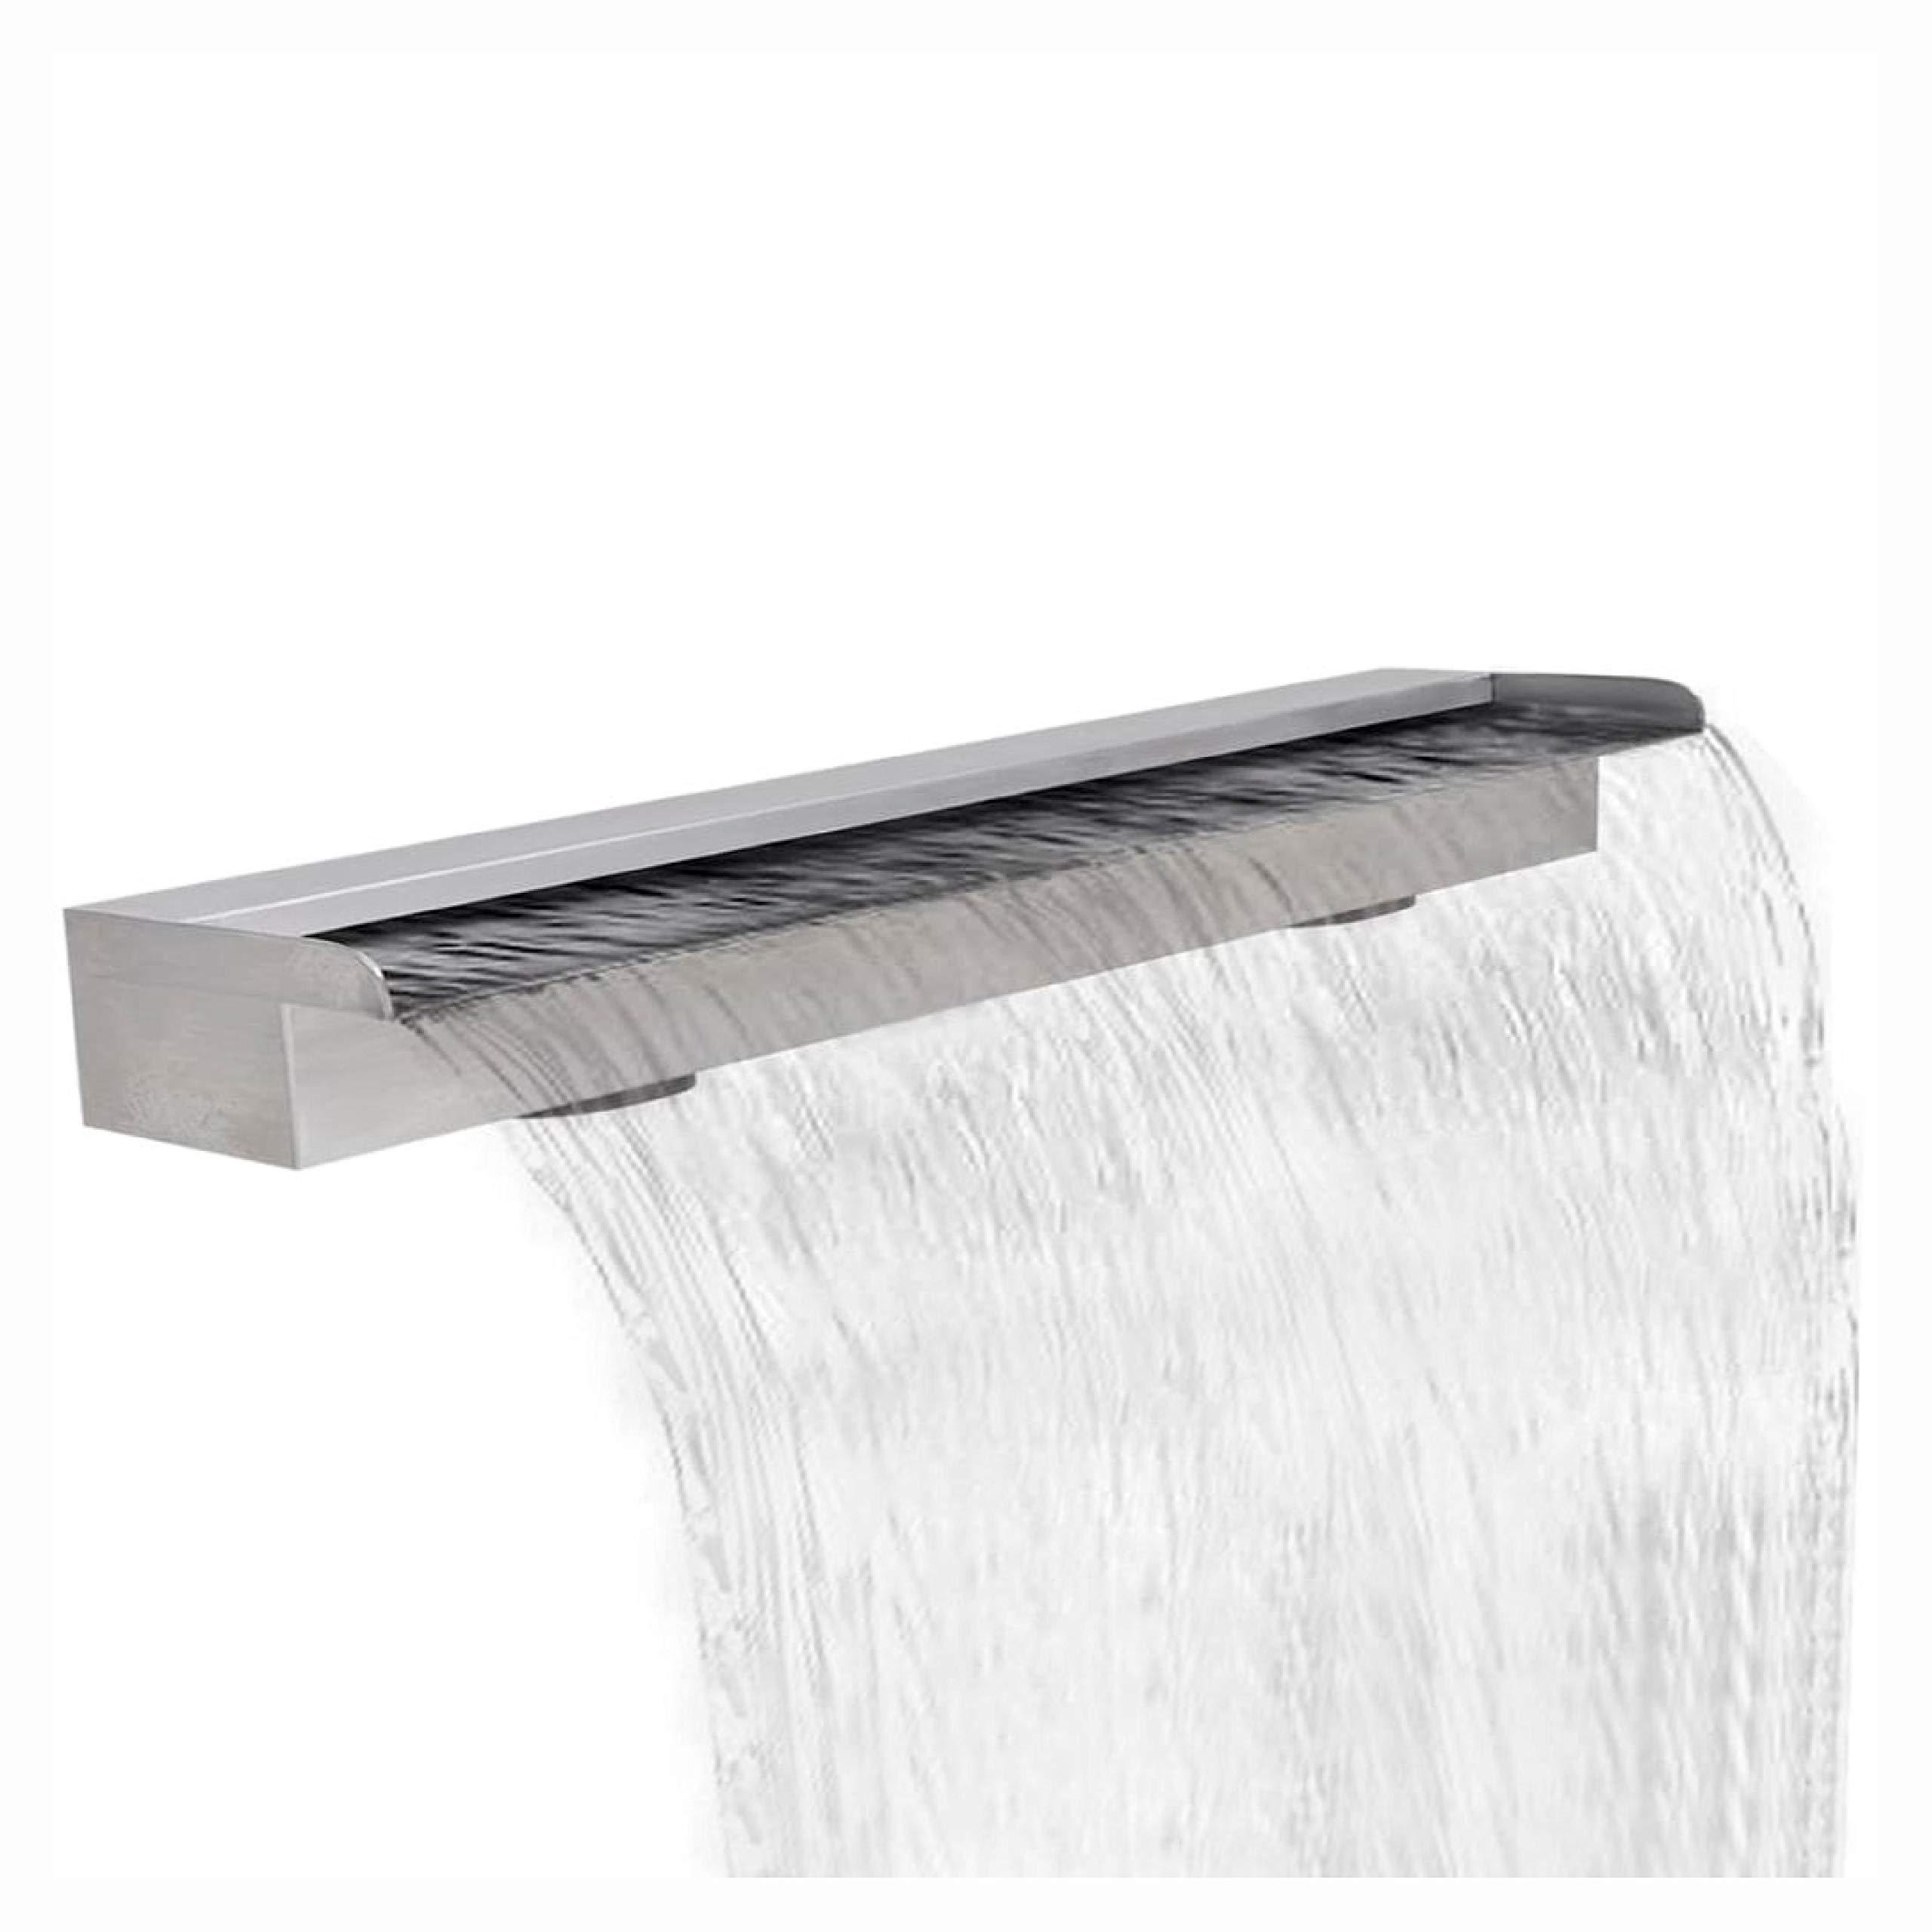 HomyDelight Fountain & Waterfall, Rectangular Waterfall Pool Fountain Stainless Steel 59''